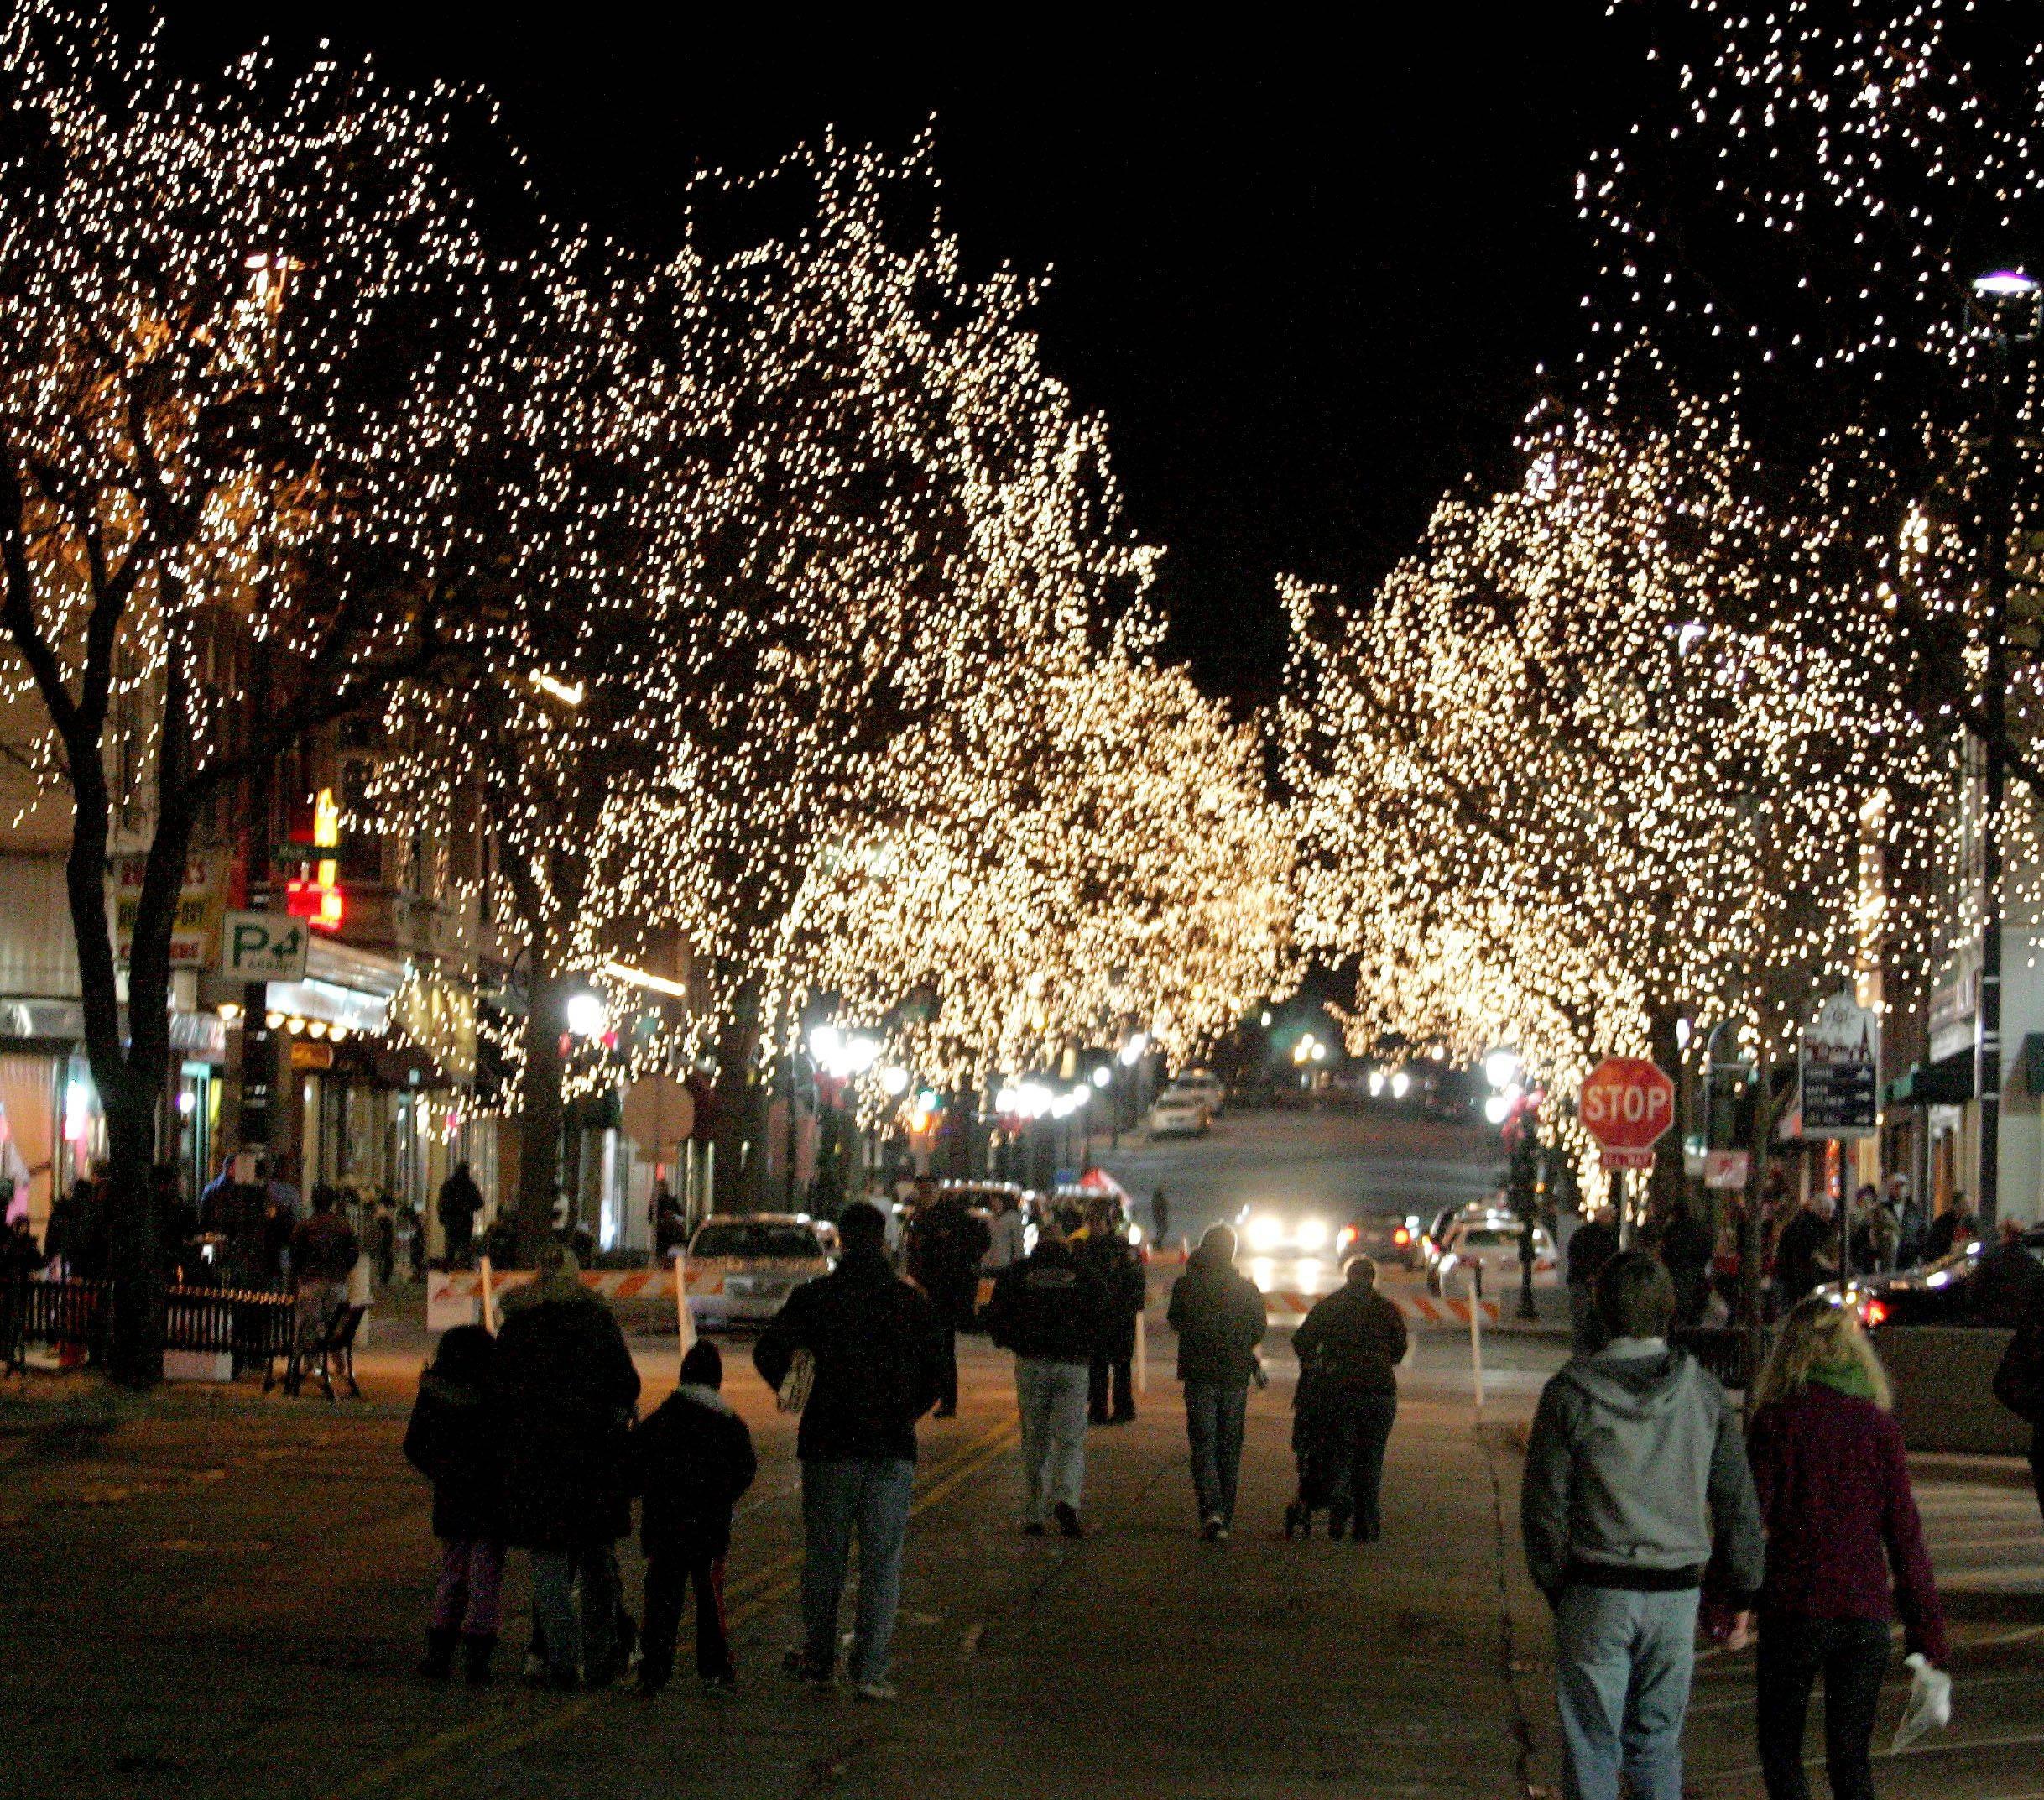 Naperville's holiday season opens with music, parade, Santa